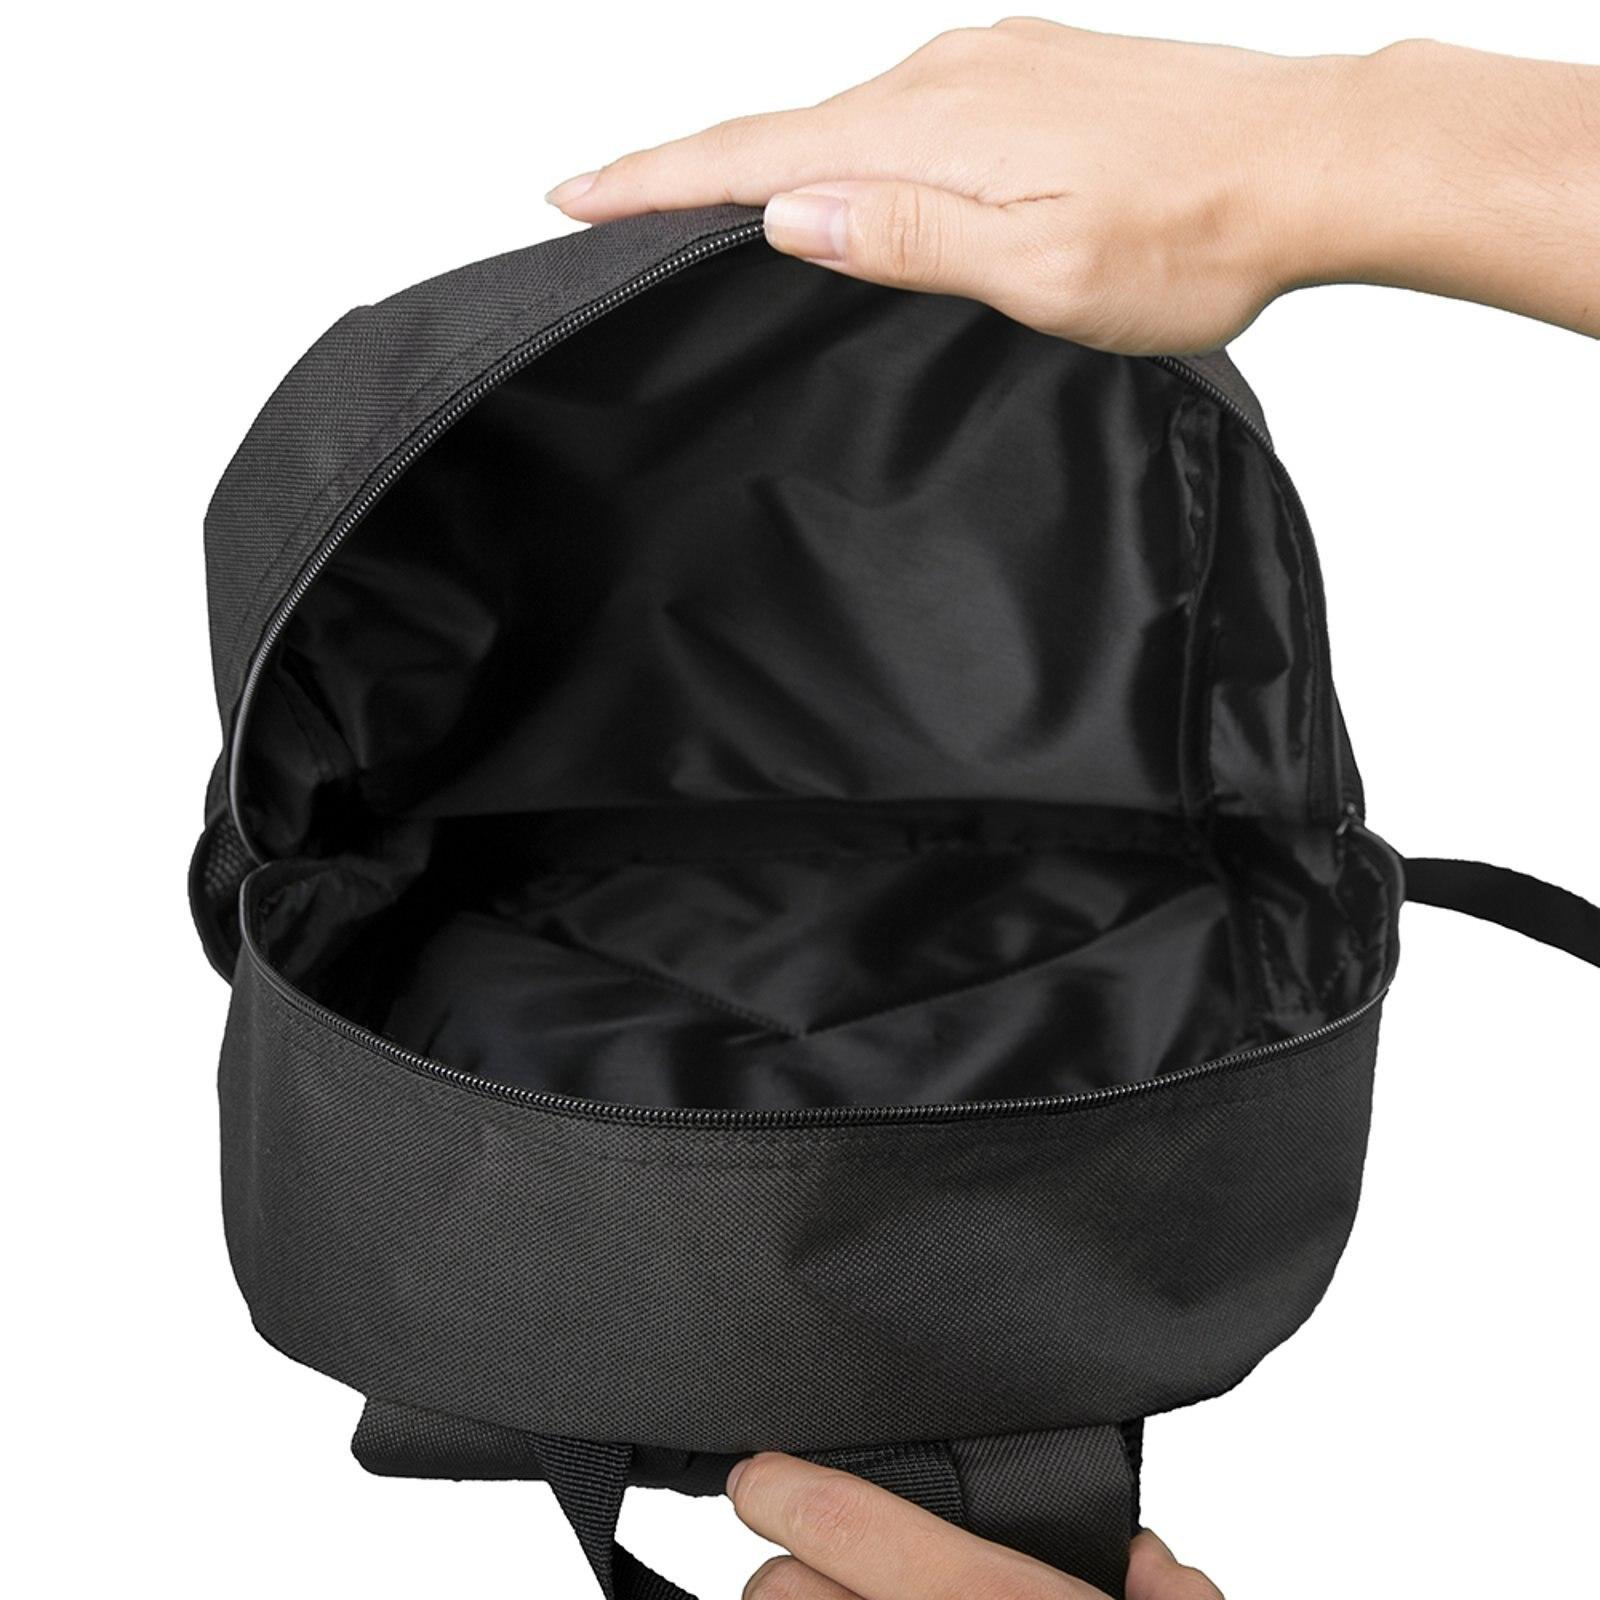 H8f1c02d2630144fbac93cb7b72a85bfbz - Anime Backpacks